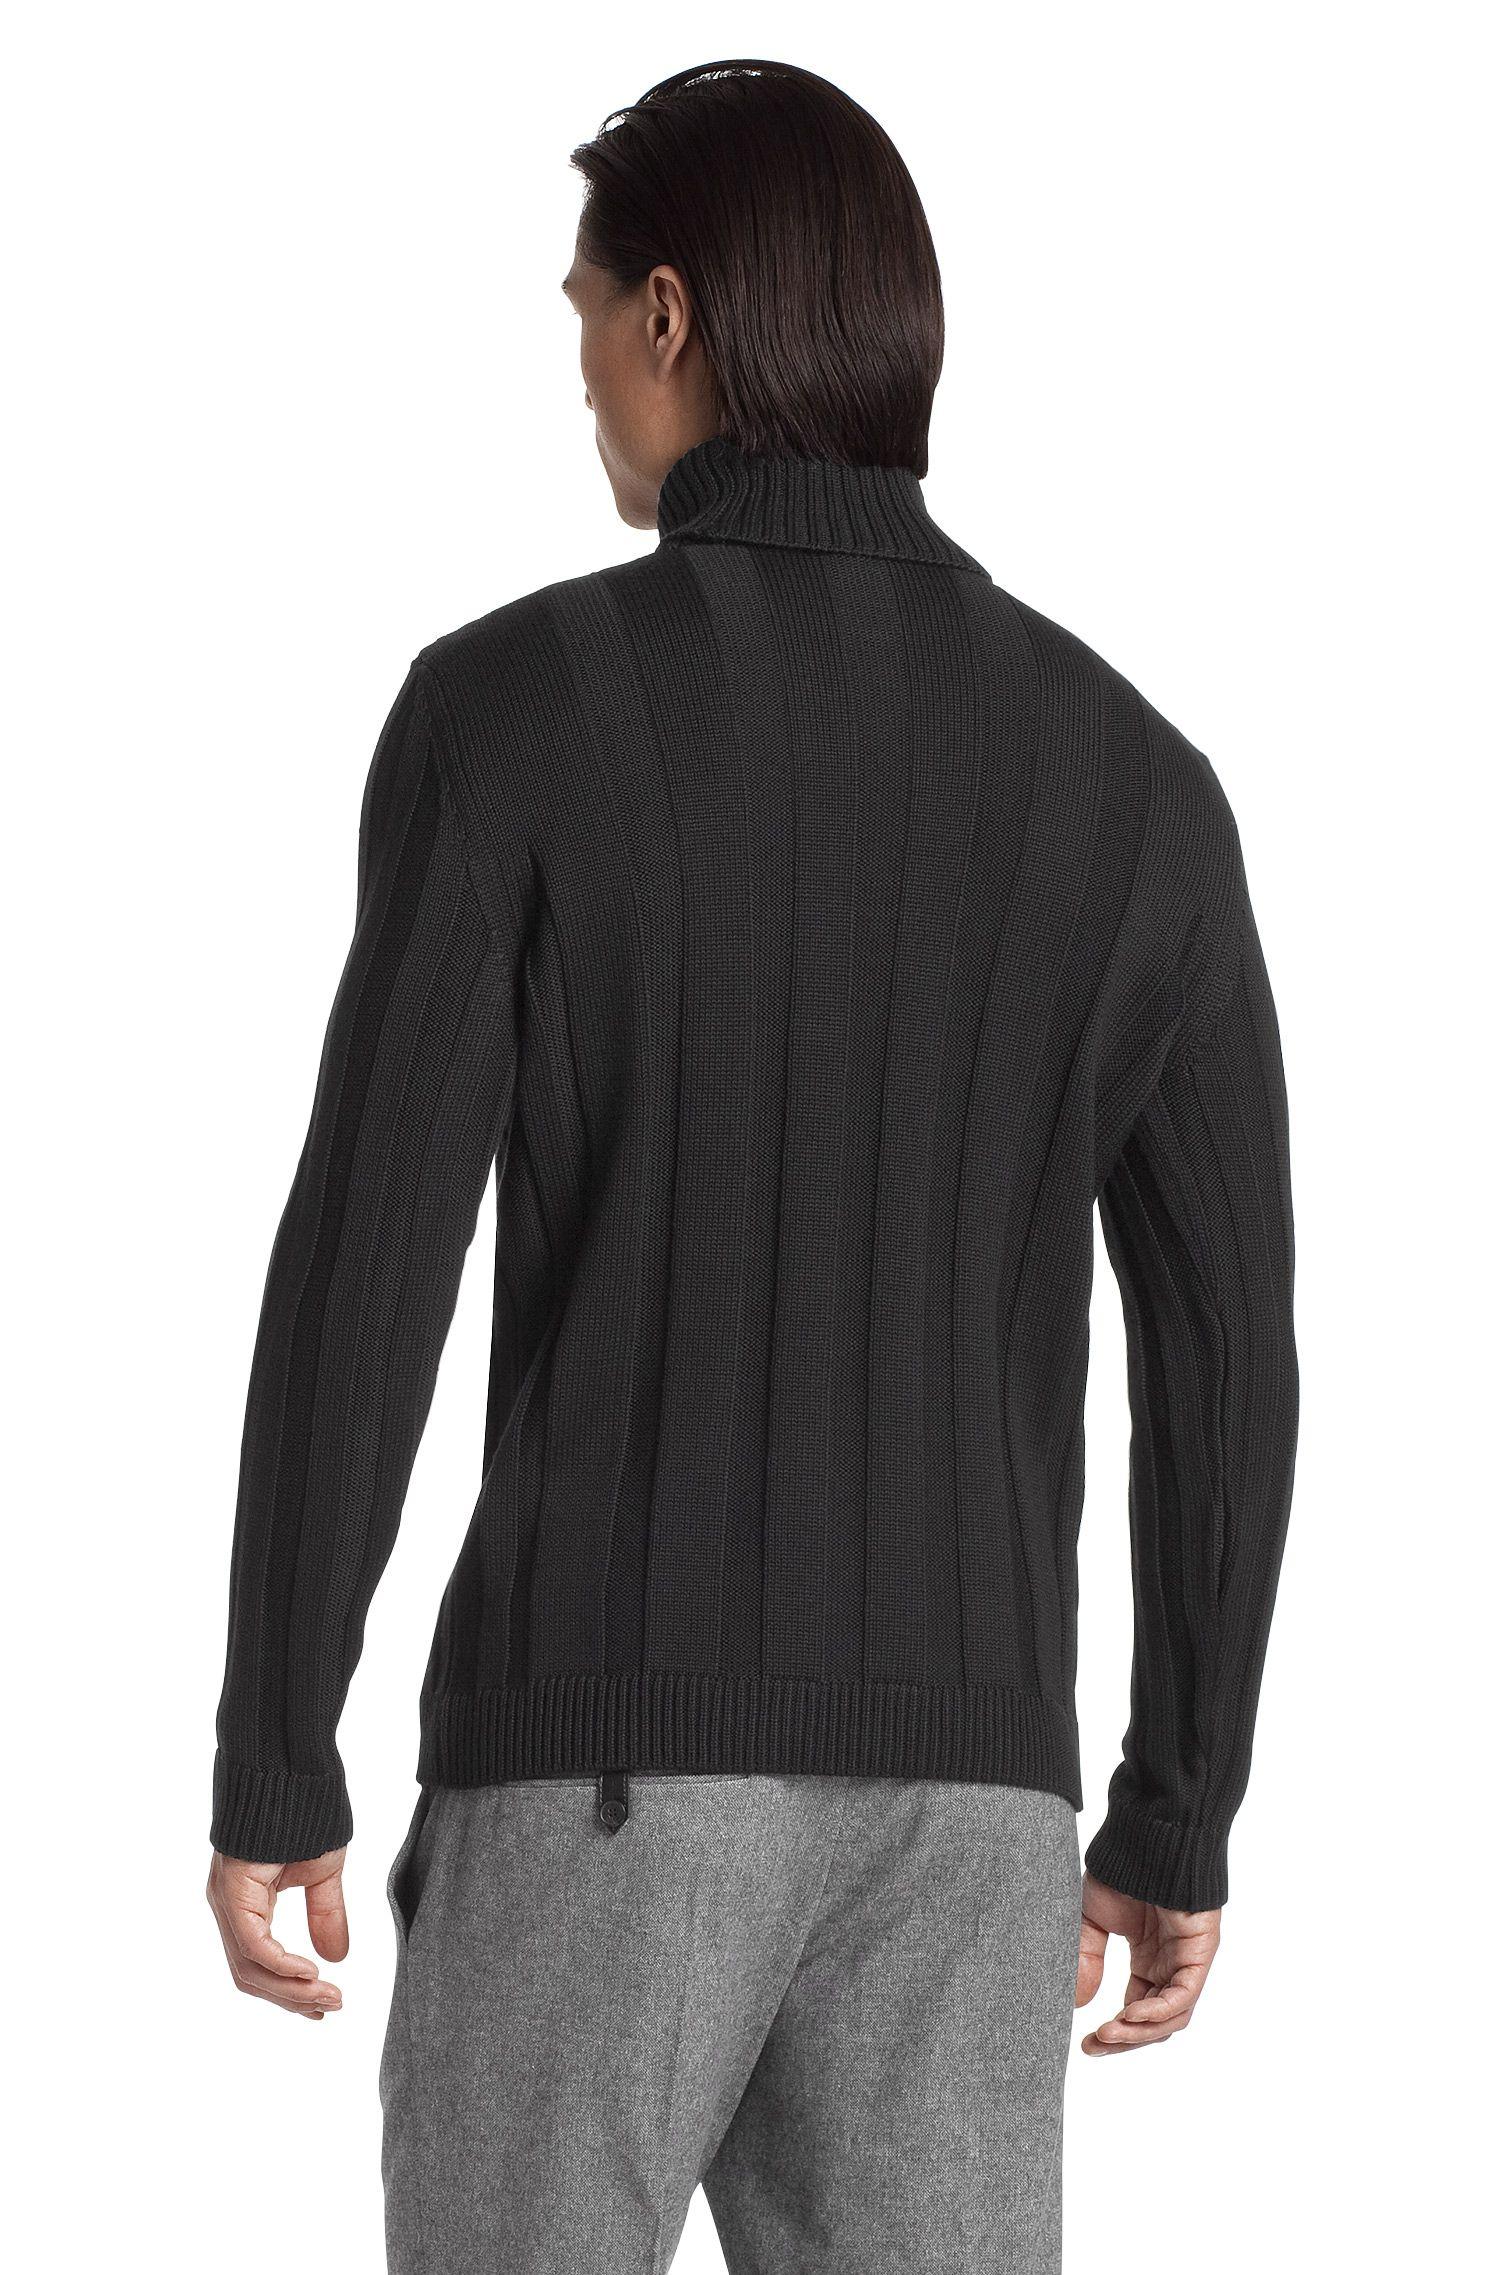 Rollkragen-Pullover ´Swutilon` aus Merinowolle